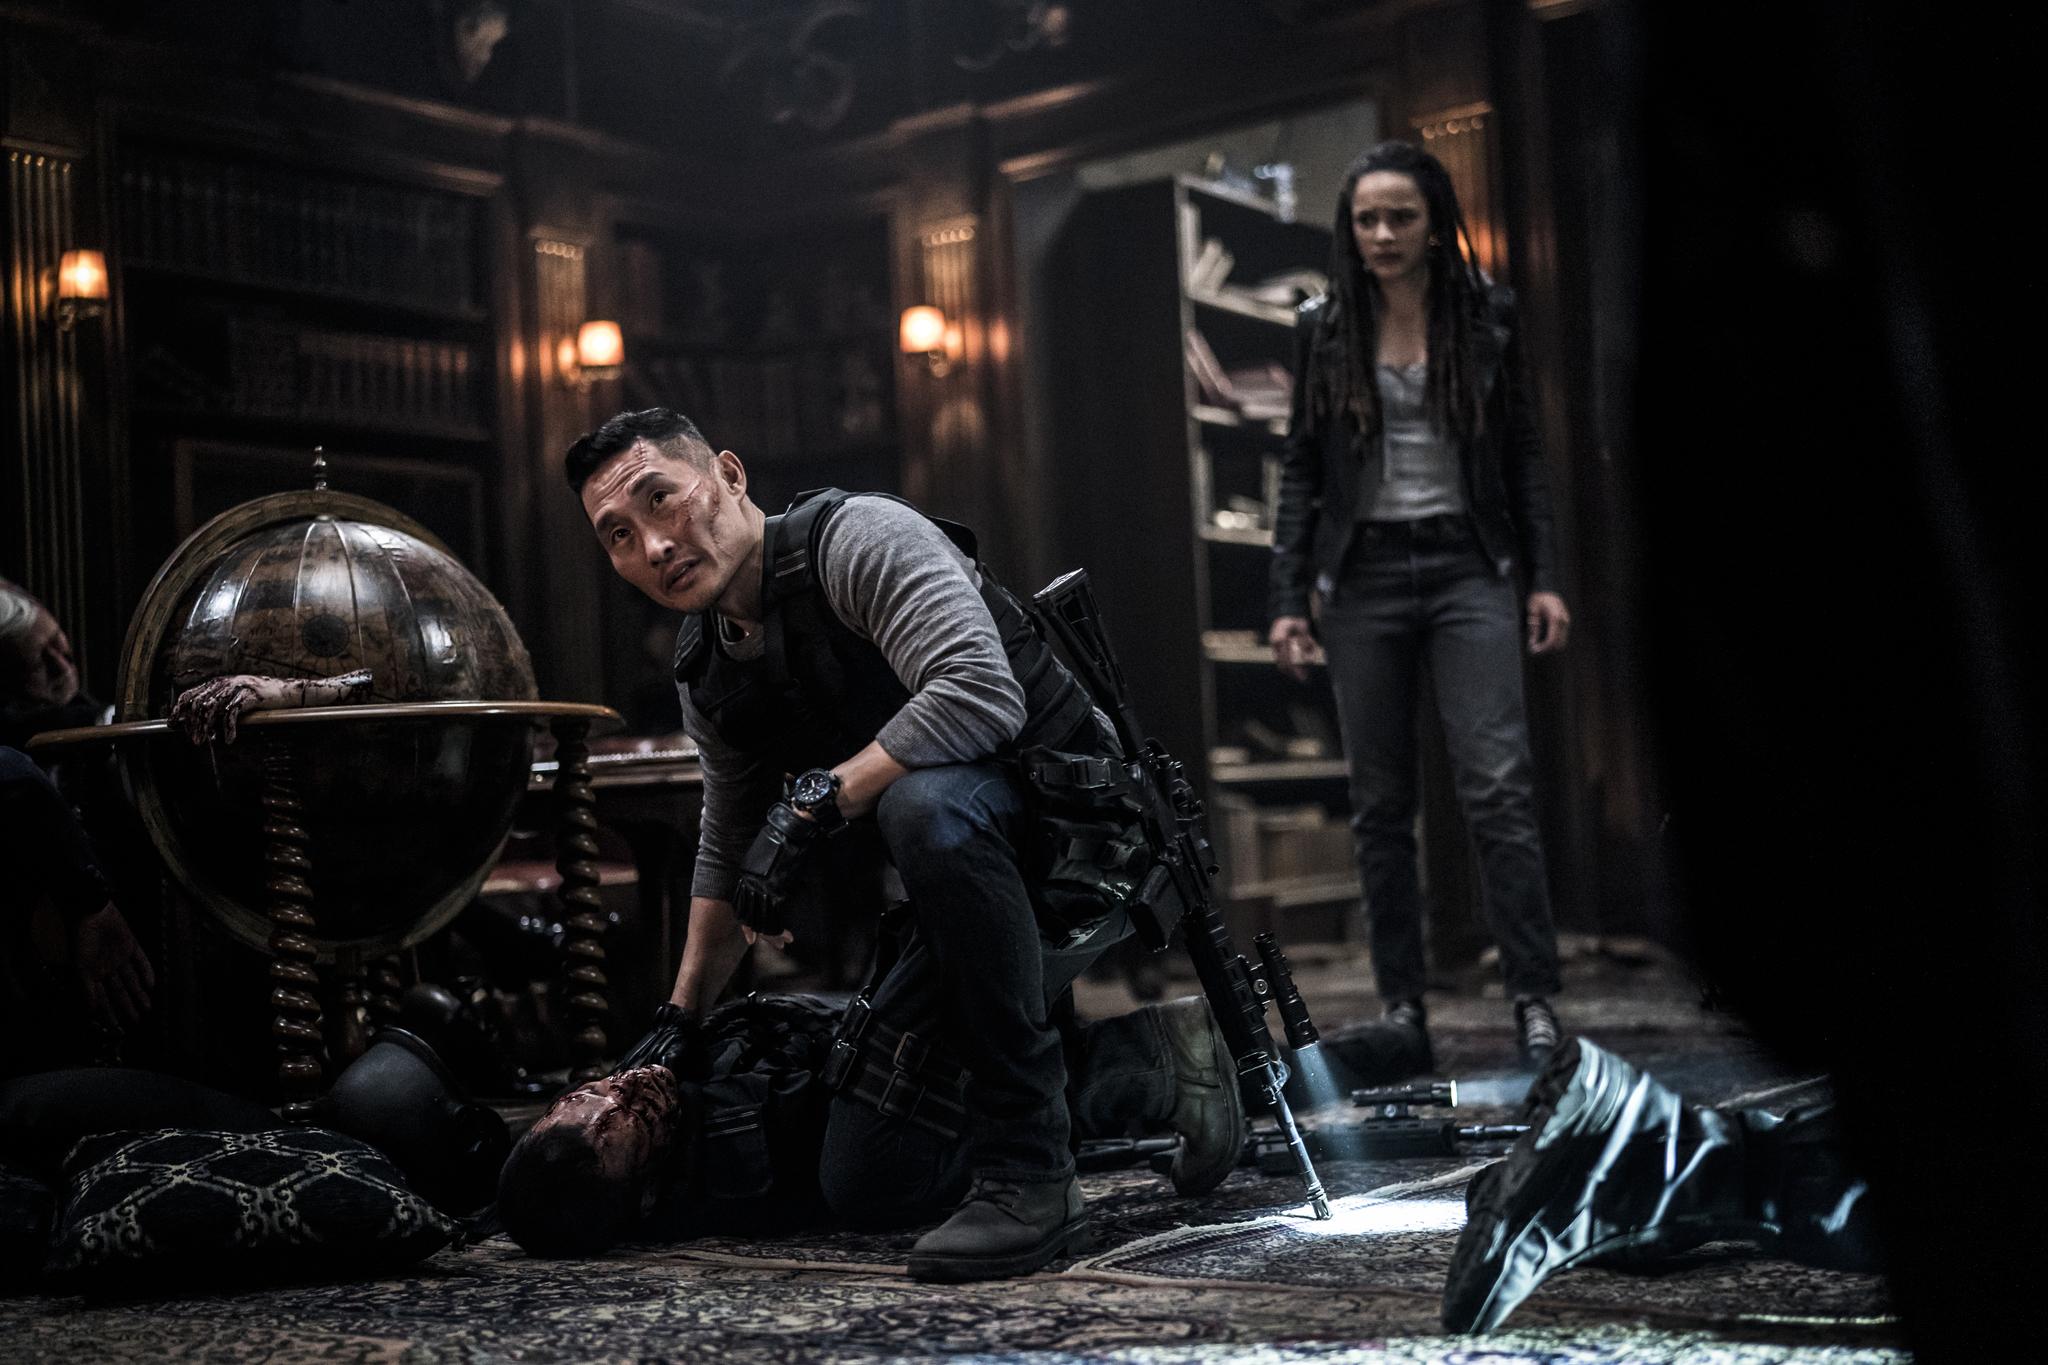 Daniel Dae Kim and Sasha Lane in Hellboy (2019)